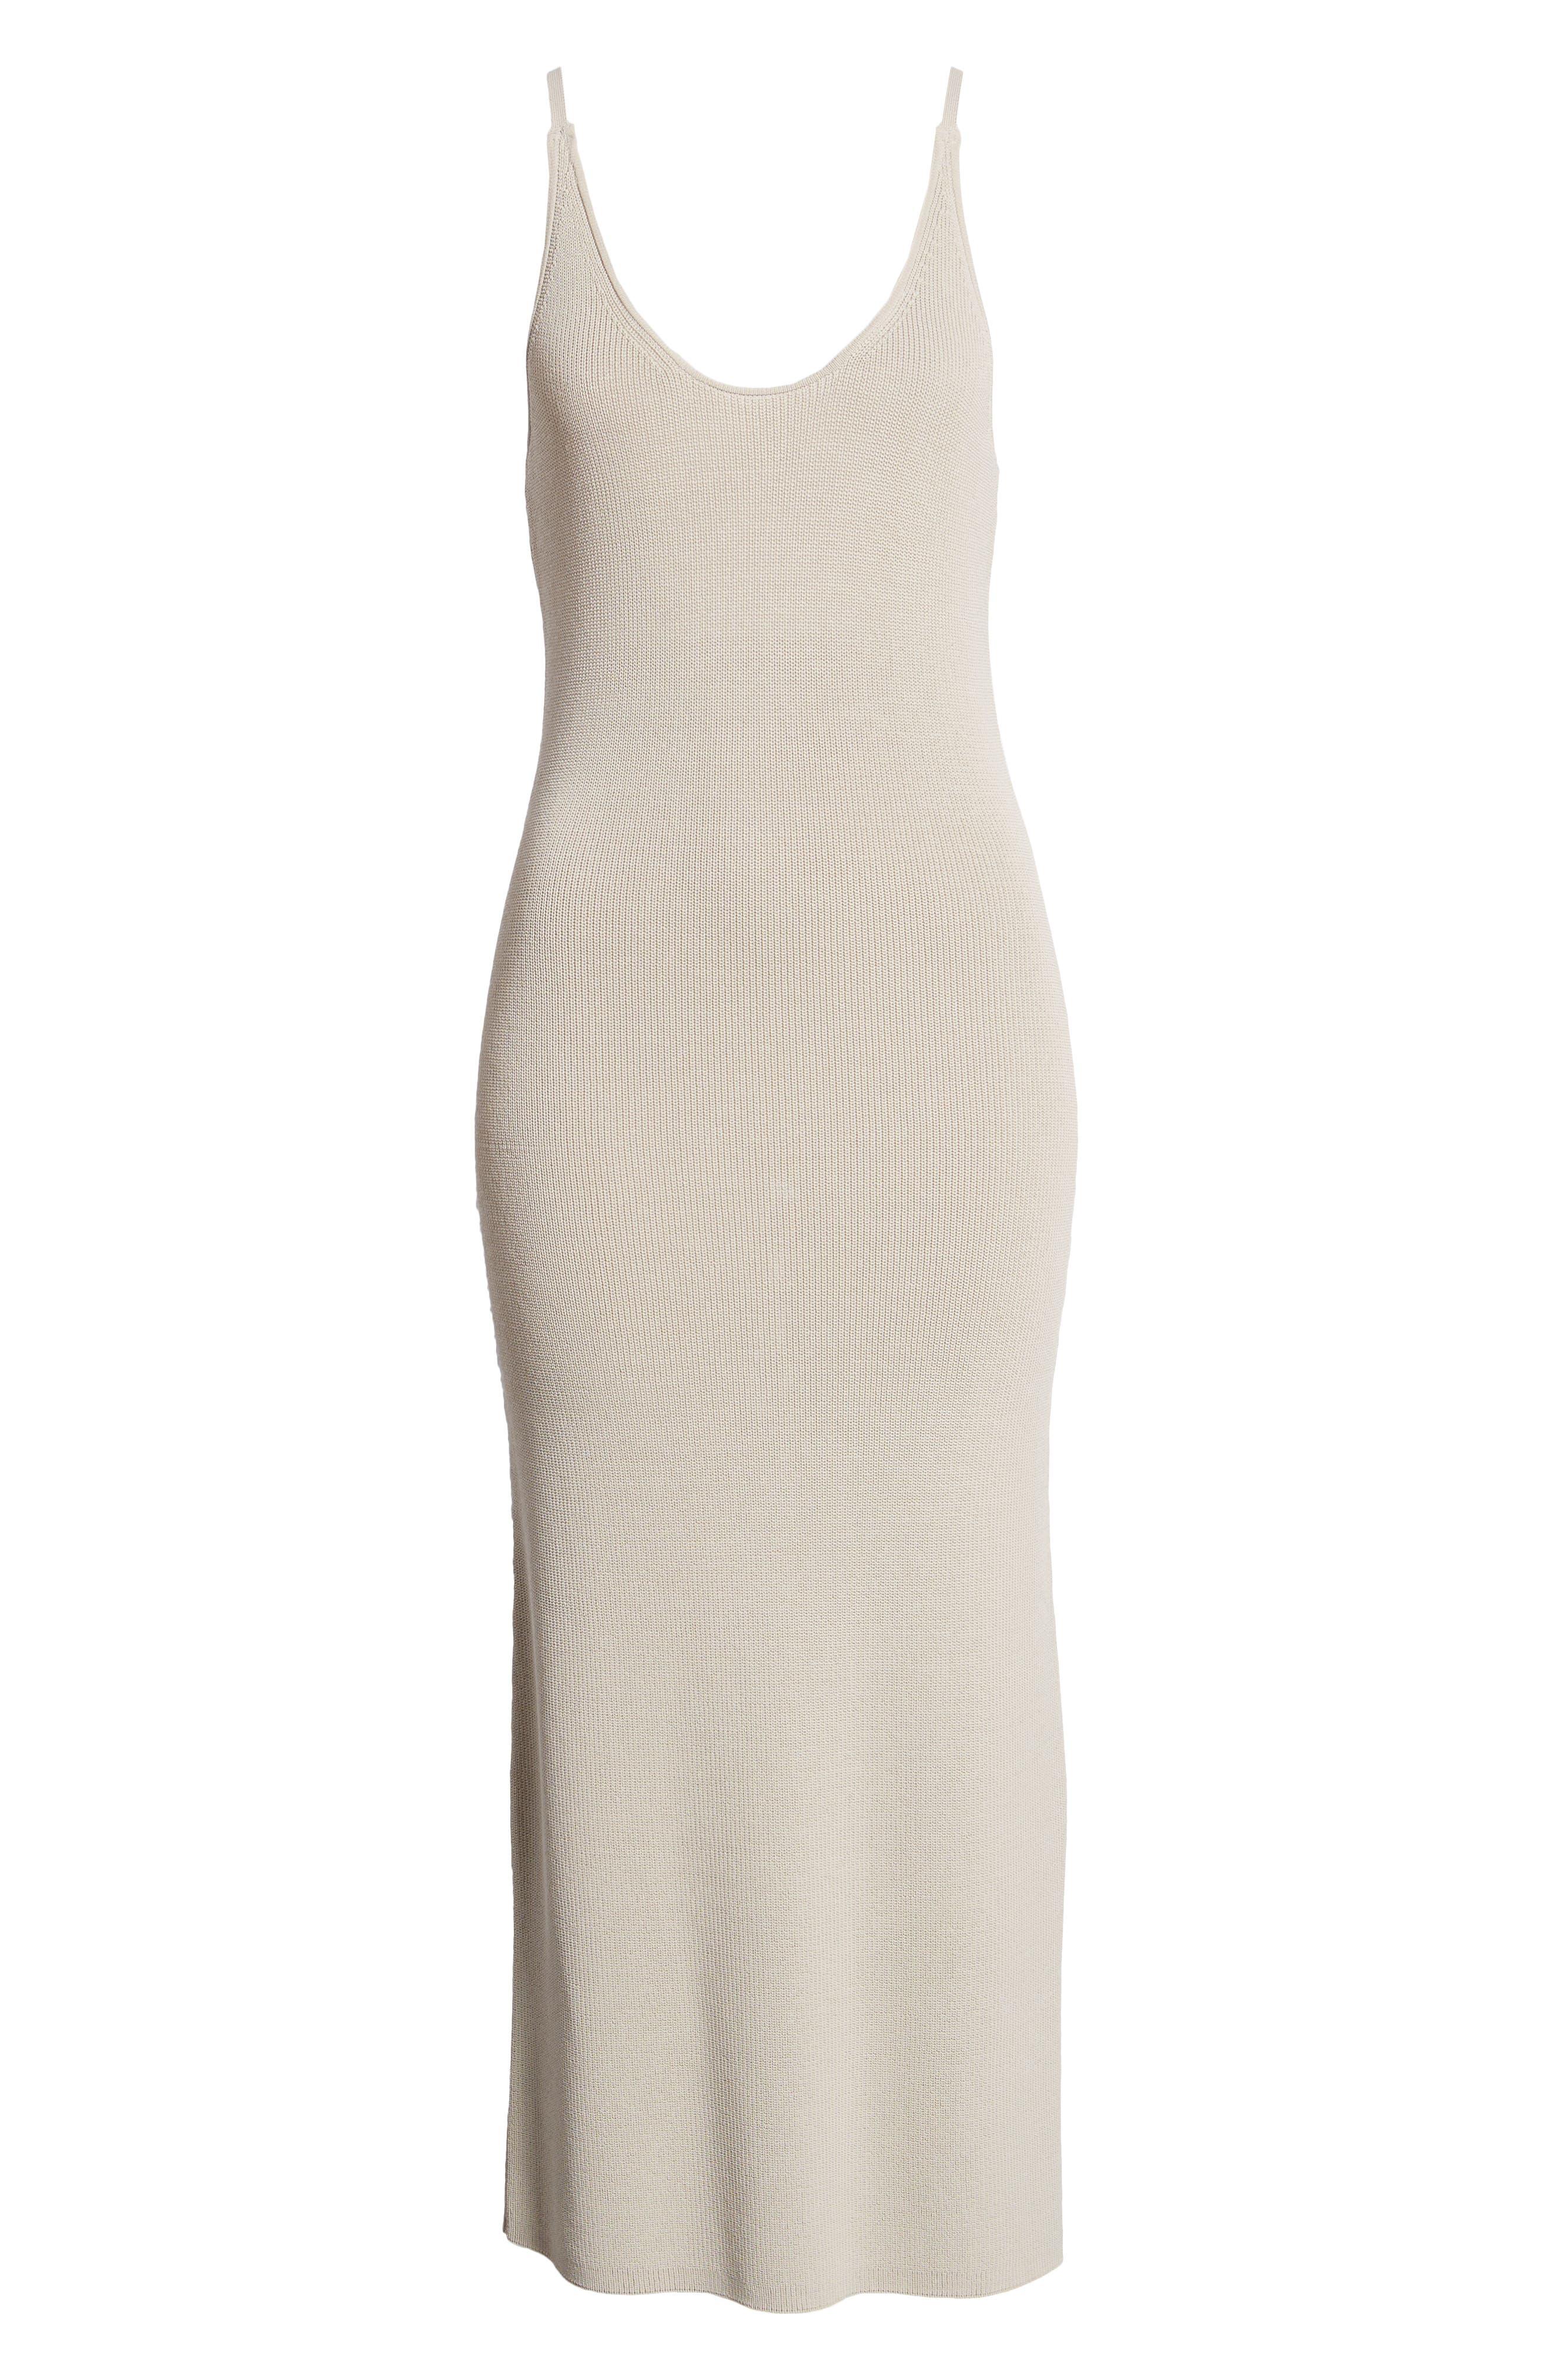 Sweater Strap Dress,                             Alternate thumbnail 7, color,                             050